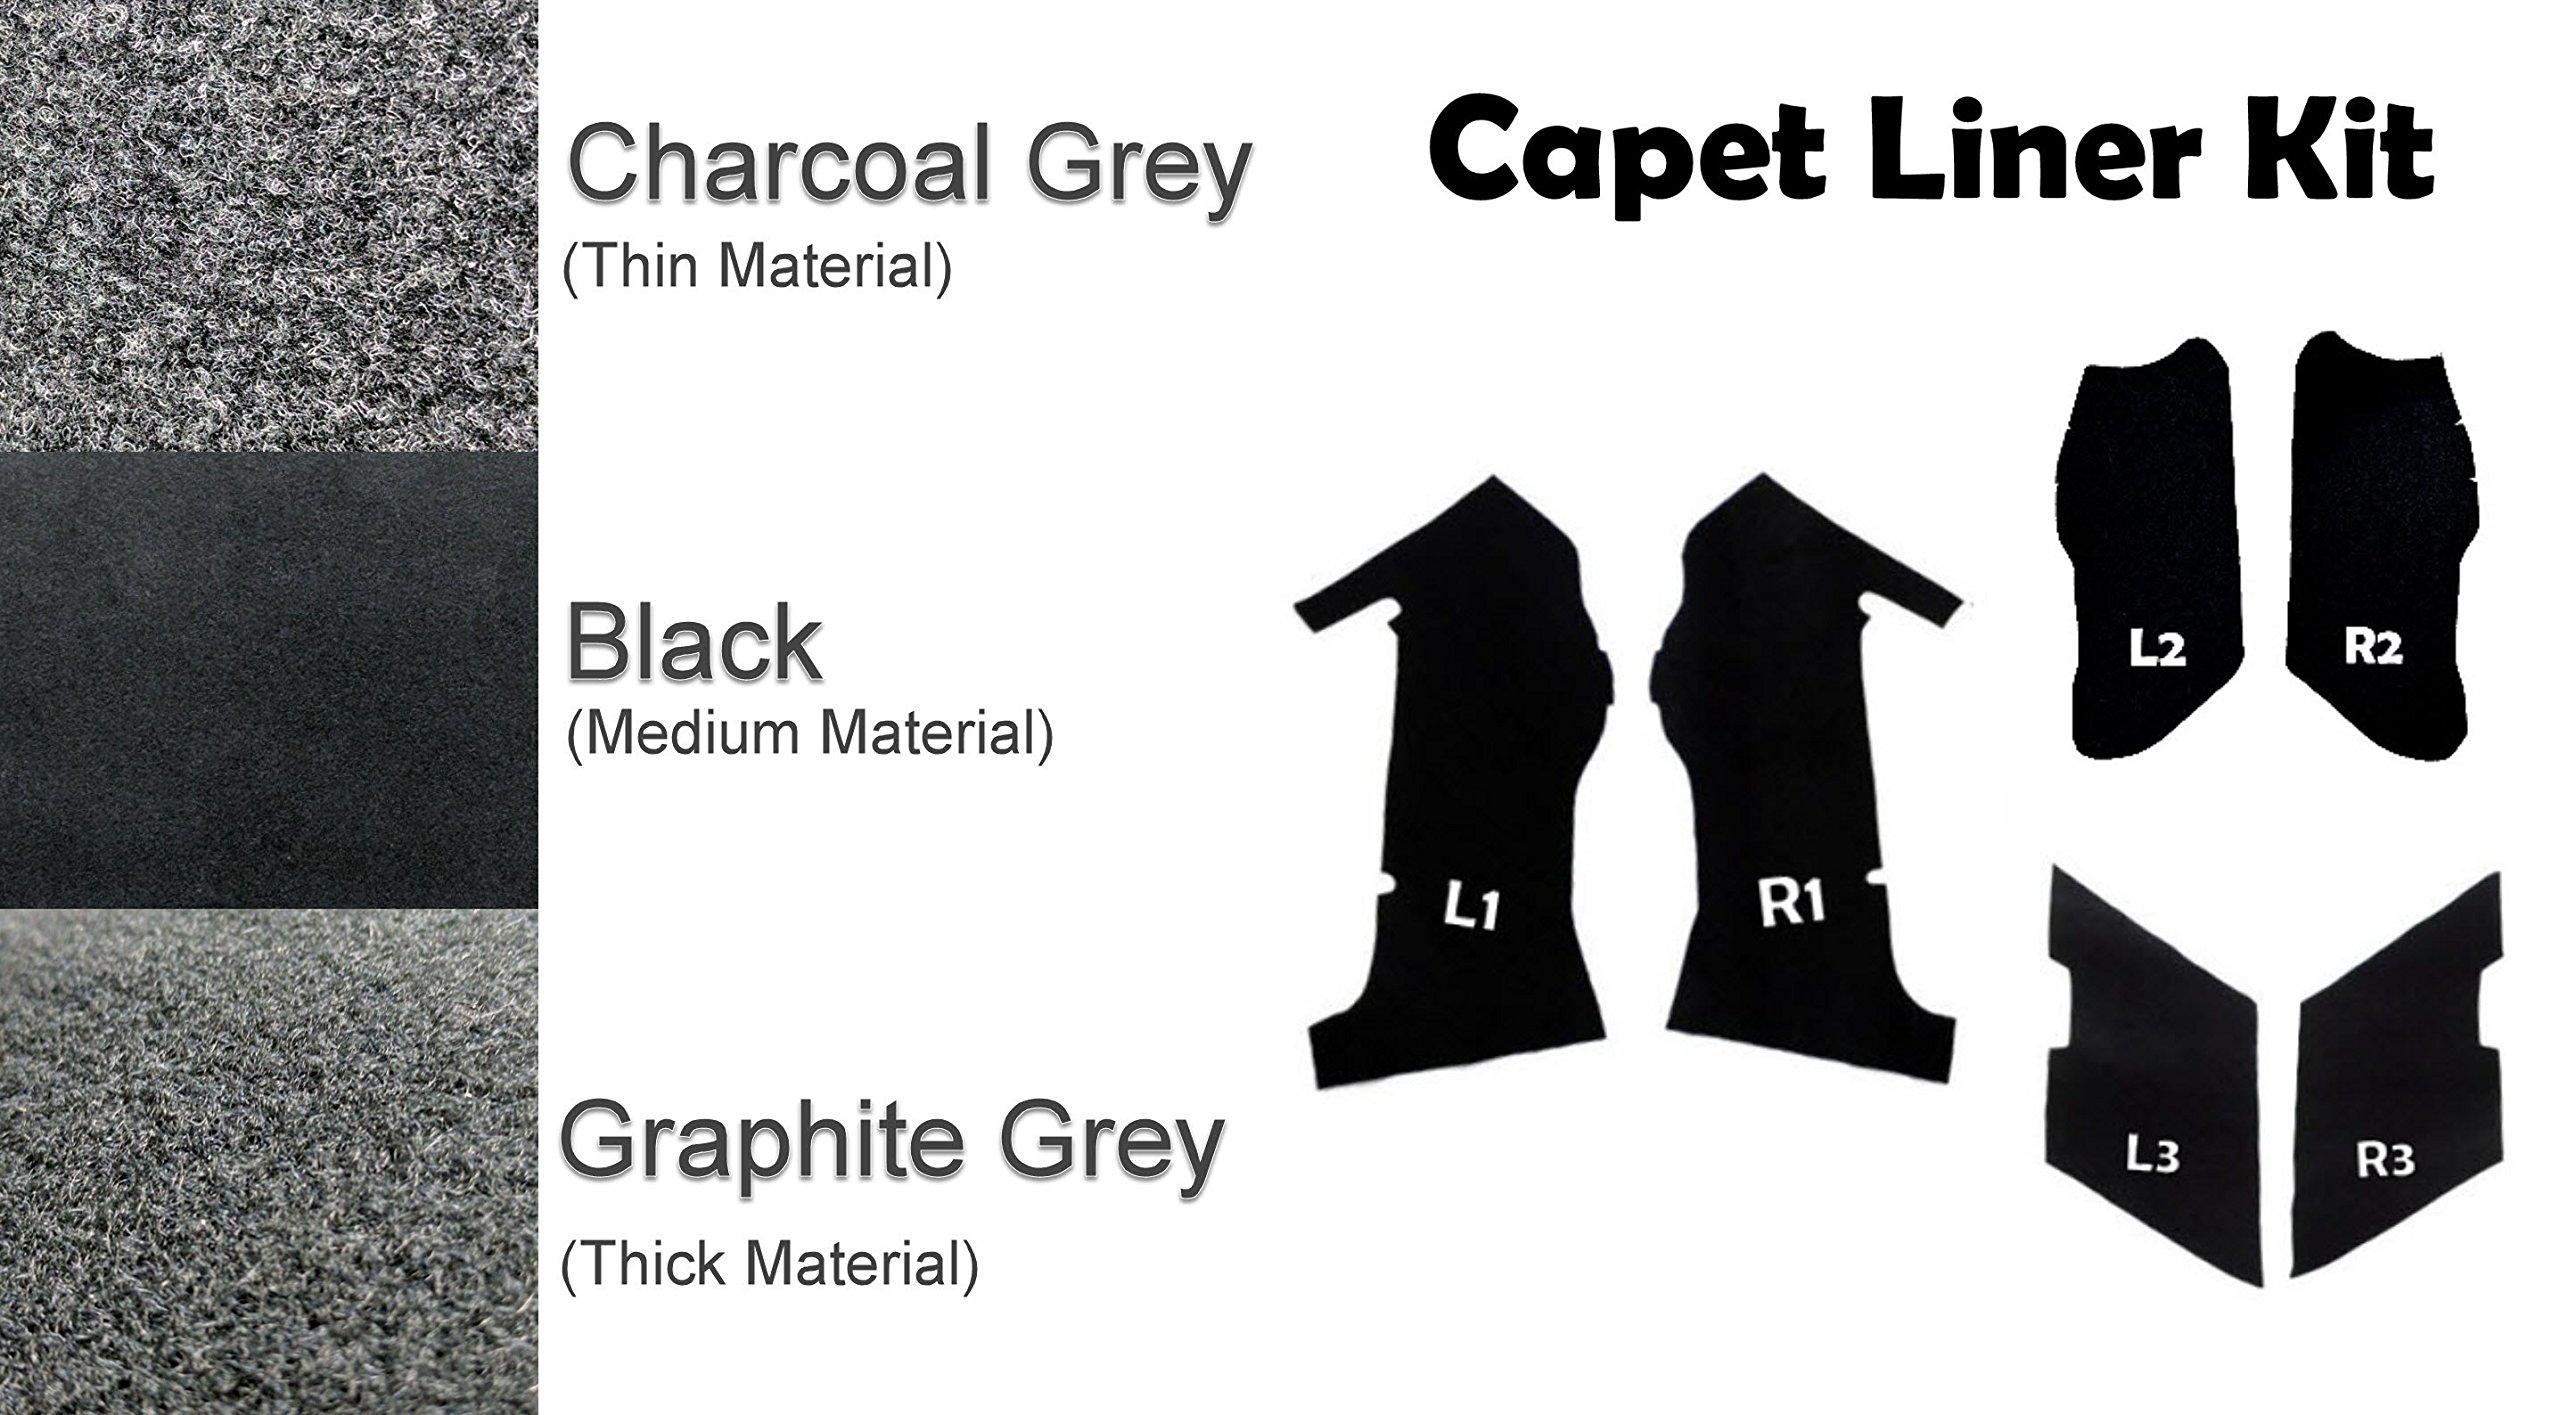 Extended Saddlebag Carpet Liner Kit for 2014-2018 Harley-Davidson 4'' or 4.5'' Stretched ABS One-Touch Saddlebags (Black)